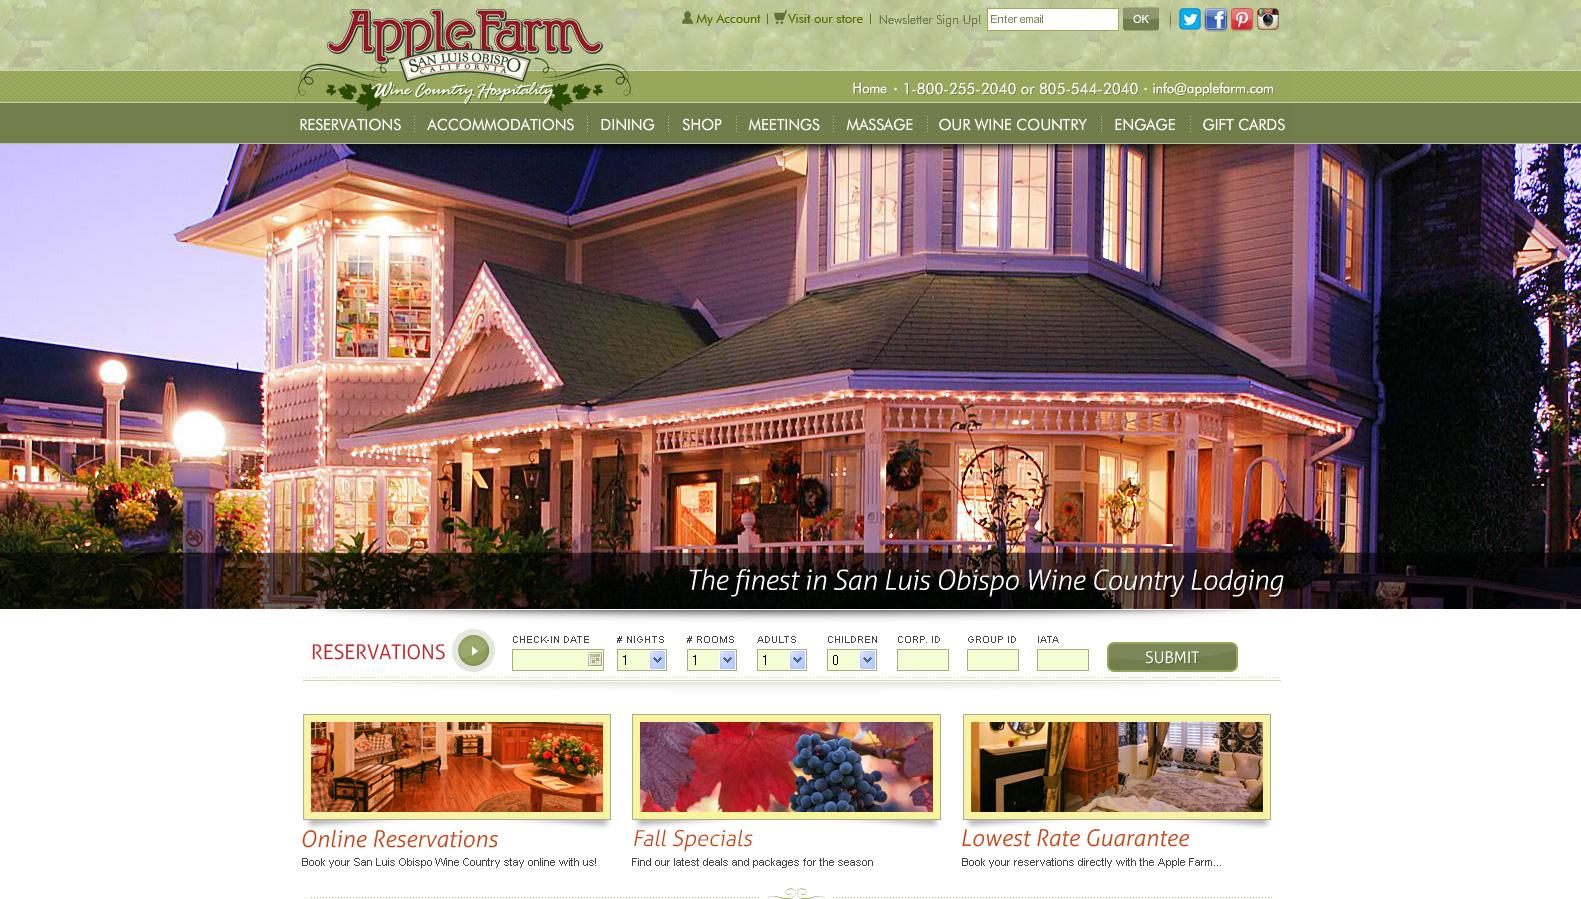 Apple Farm Inn Hotel & Lodging